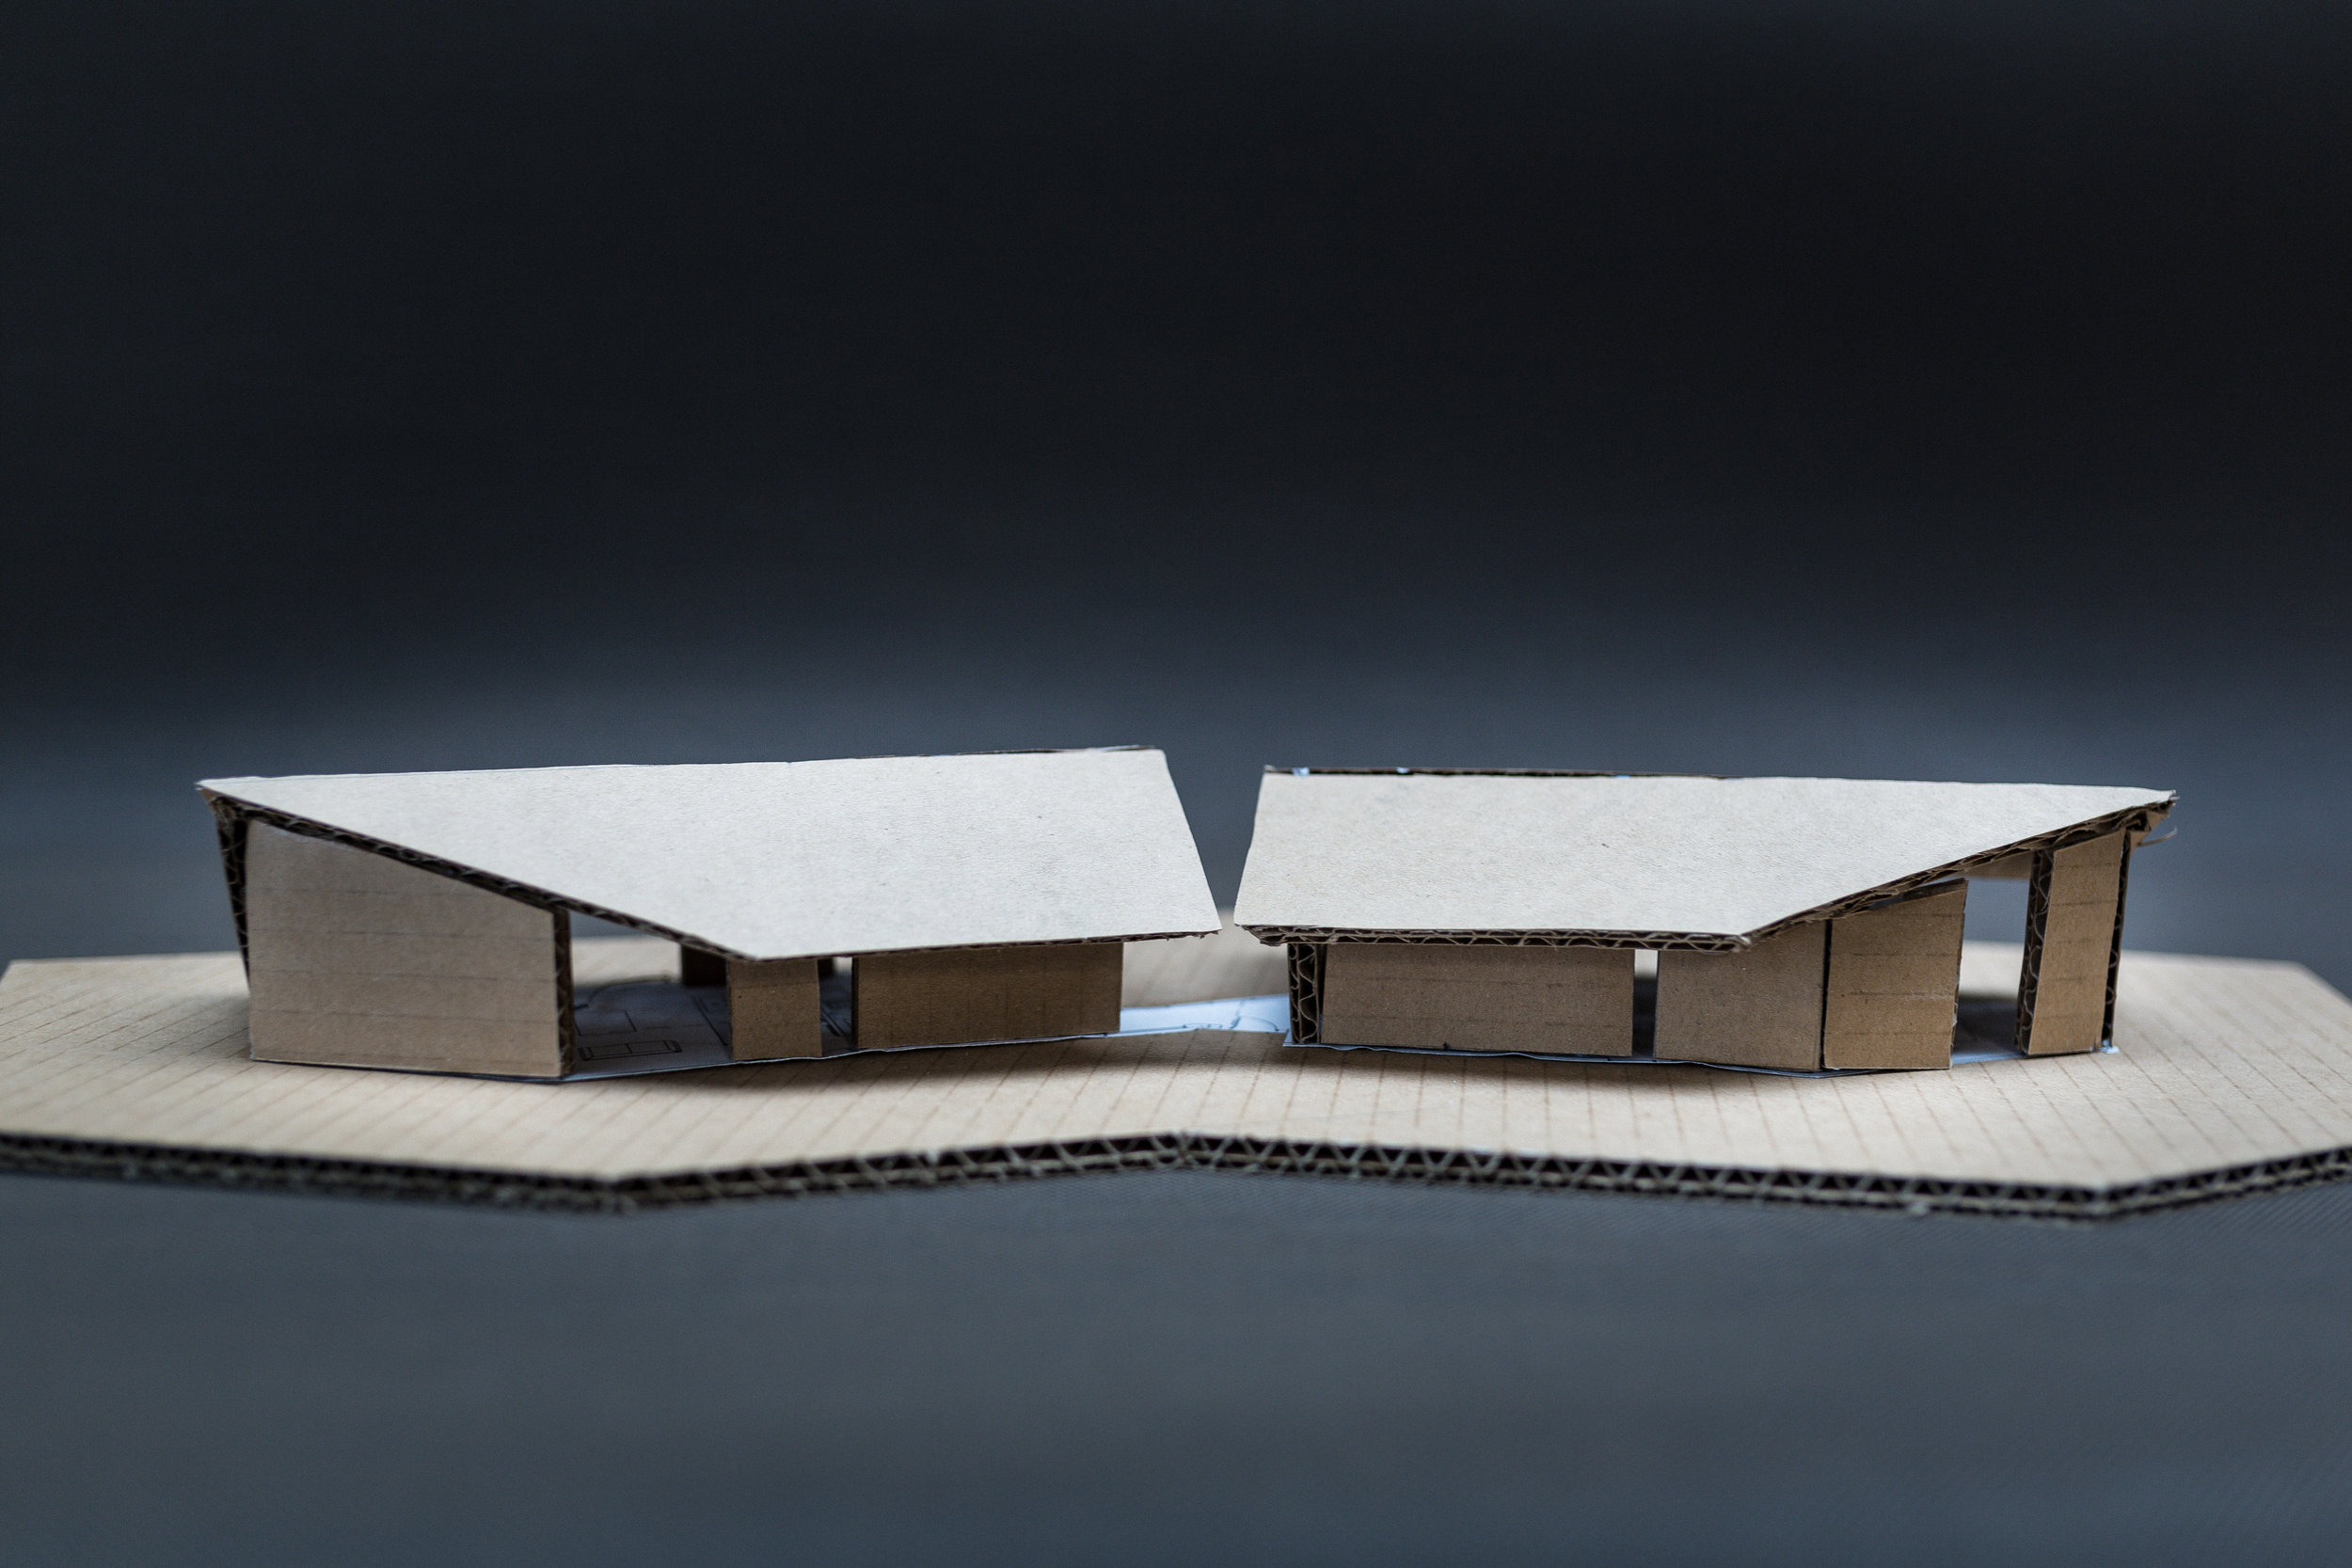 Dreamer_Architecture_interior_Lorne__Design_twosheds_03.jpg